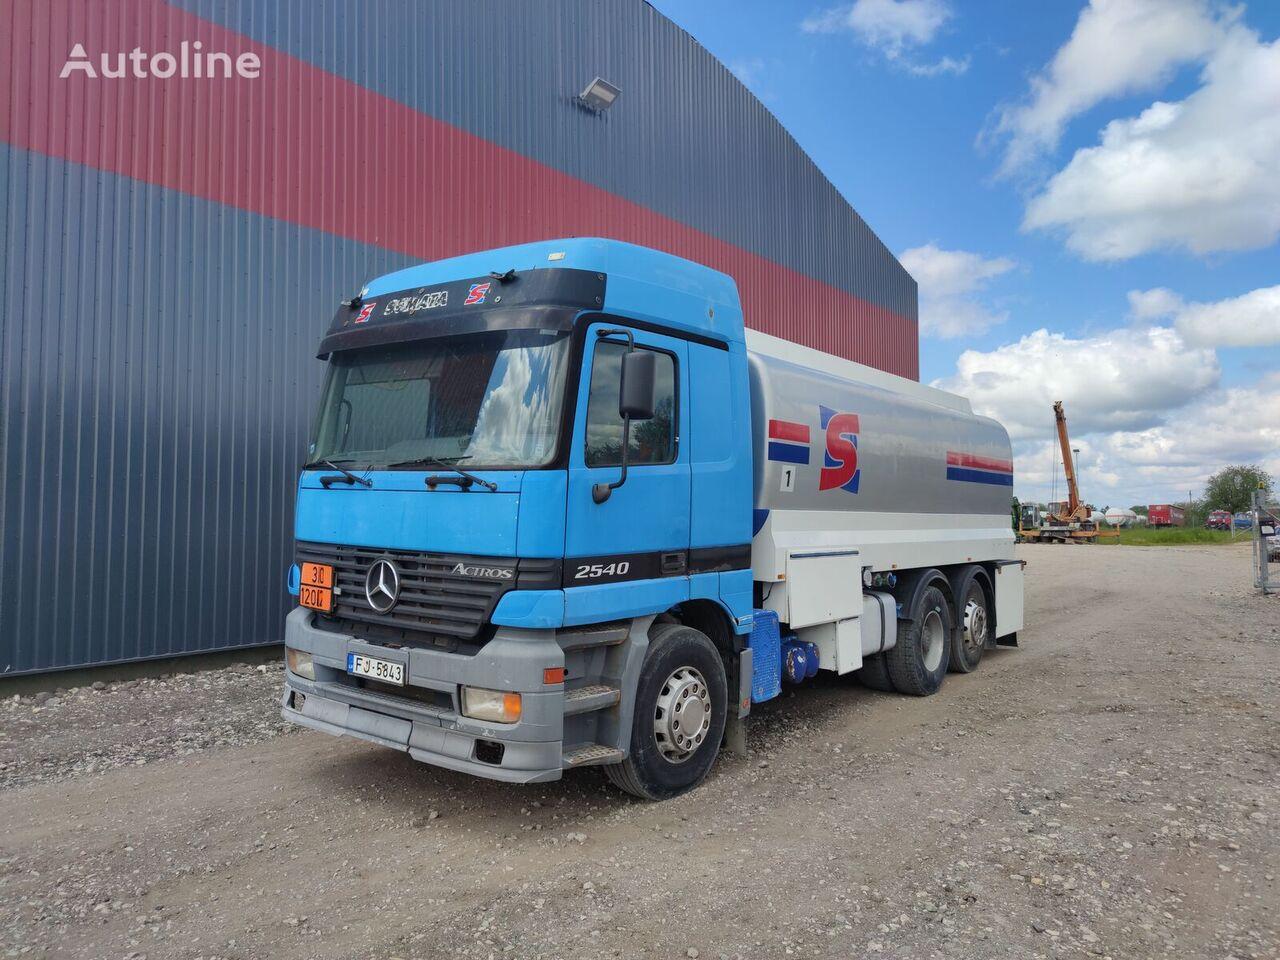 benzovežis sunkvežimis MERCEDES-BENZ 2540